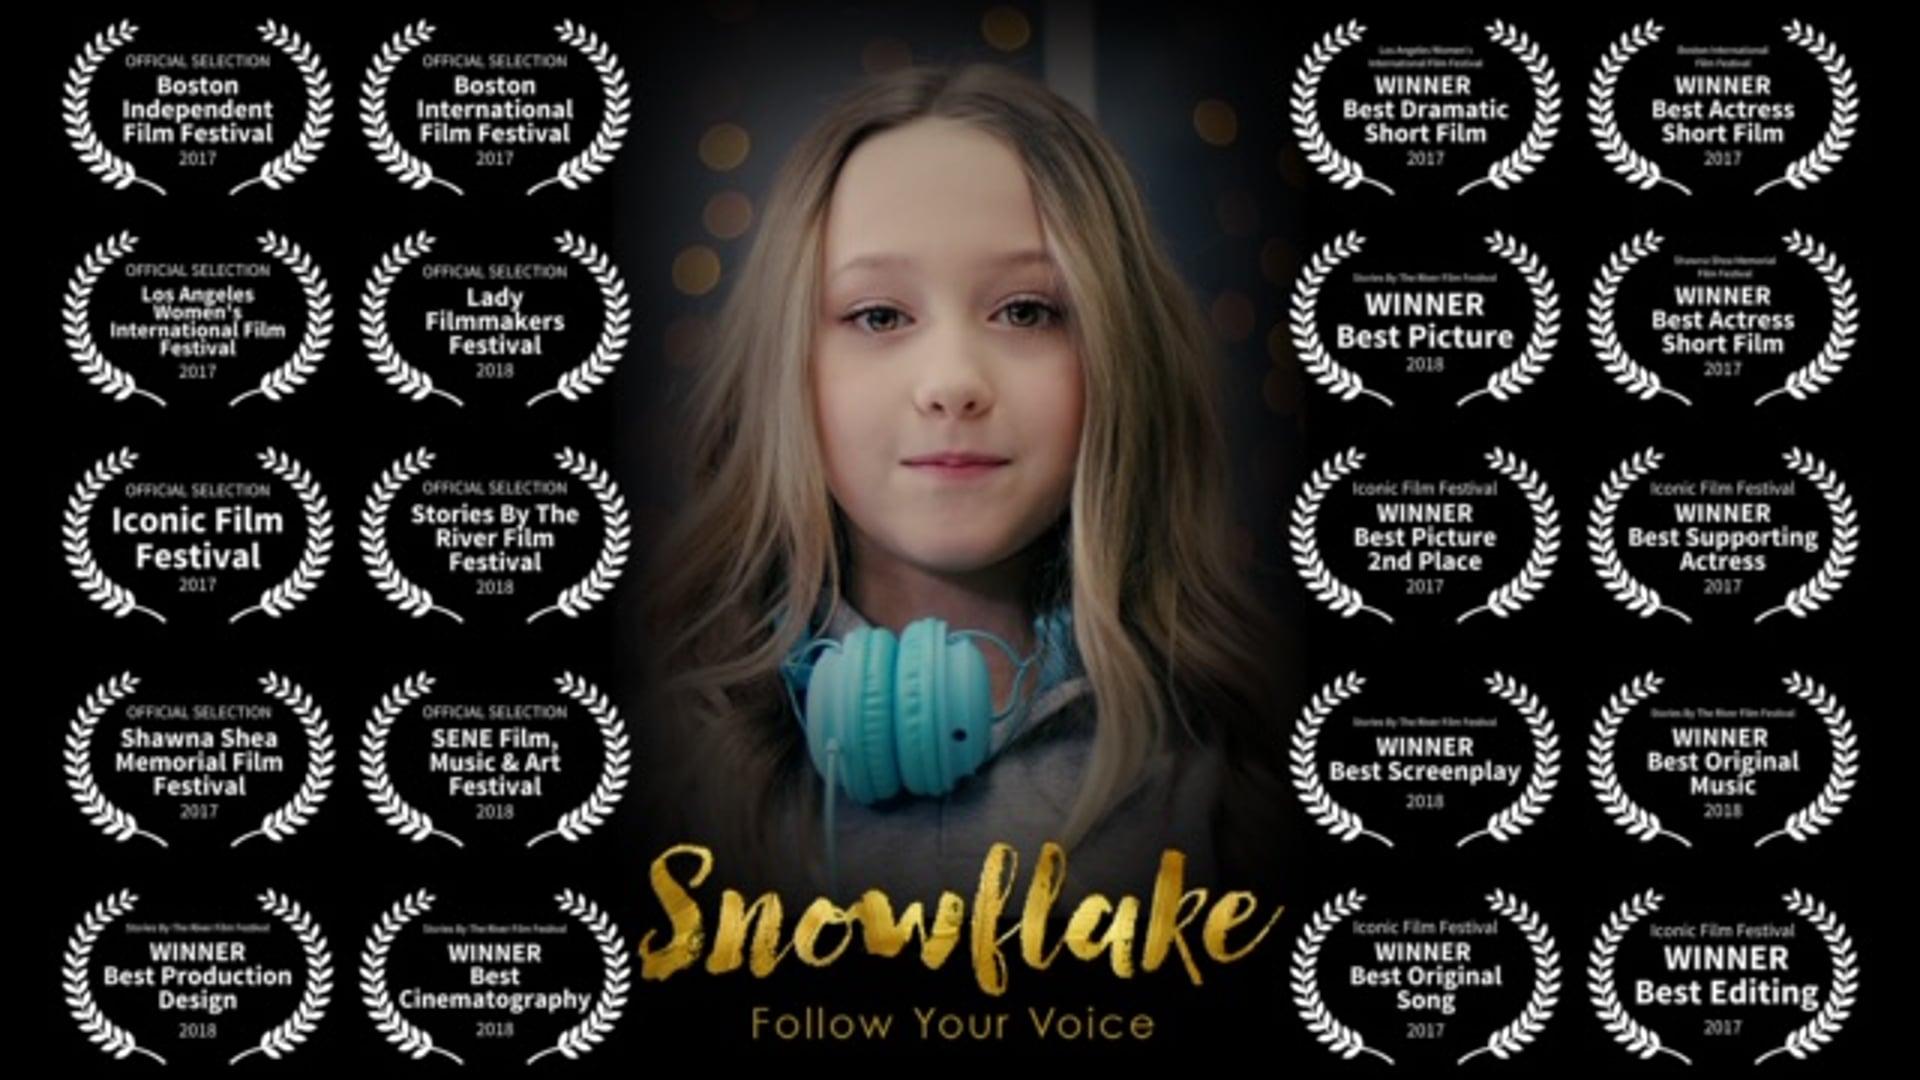 Snowflake Trailer